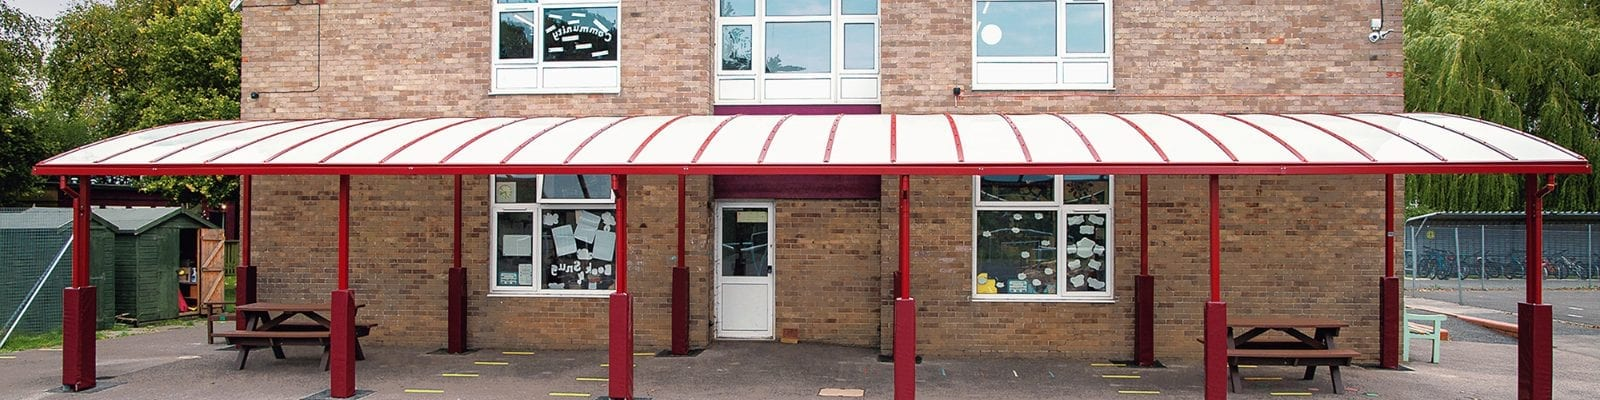 Curved roof shelter we designed for Covingham Park Primary School